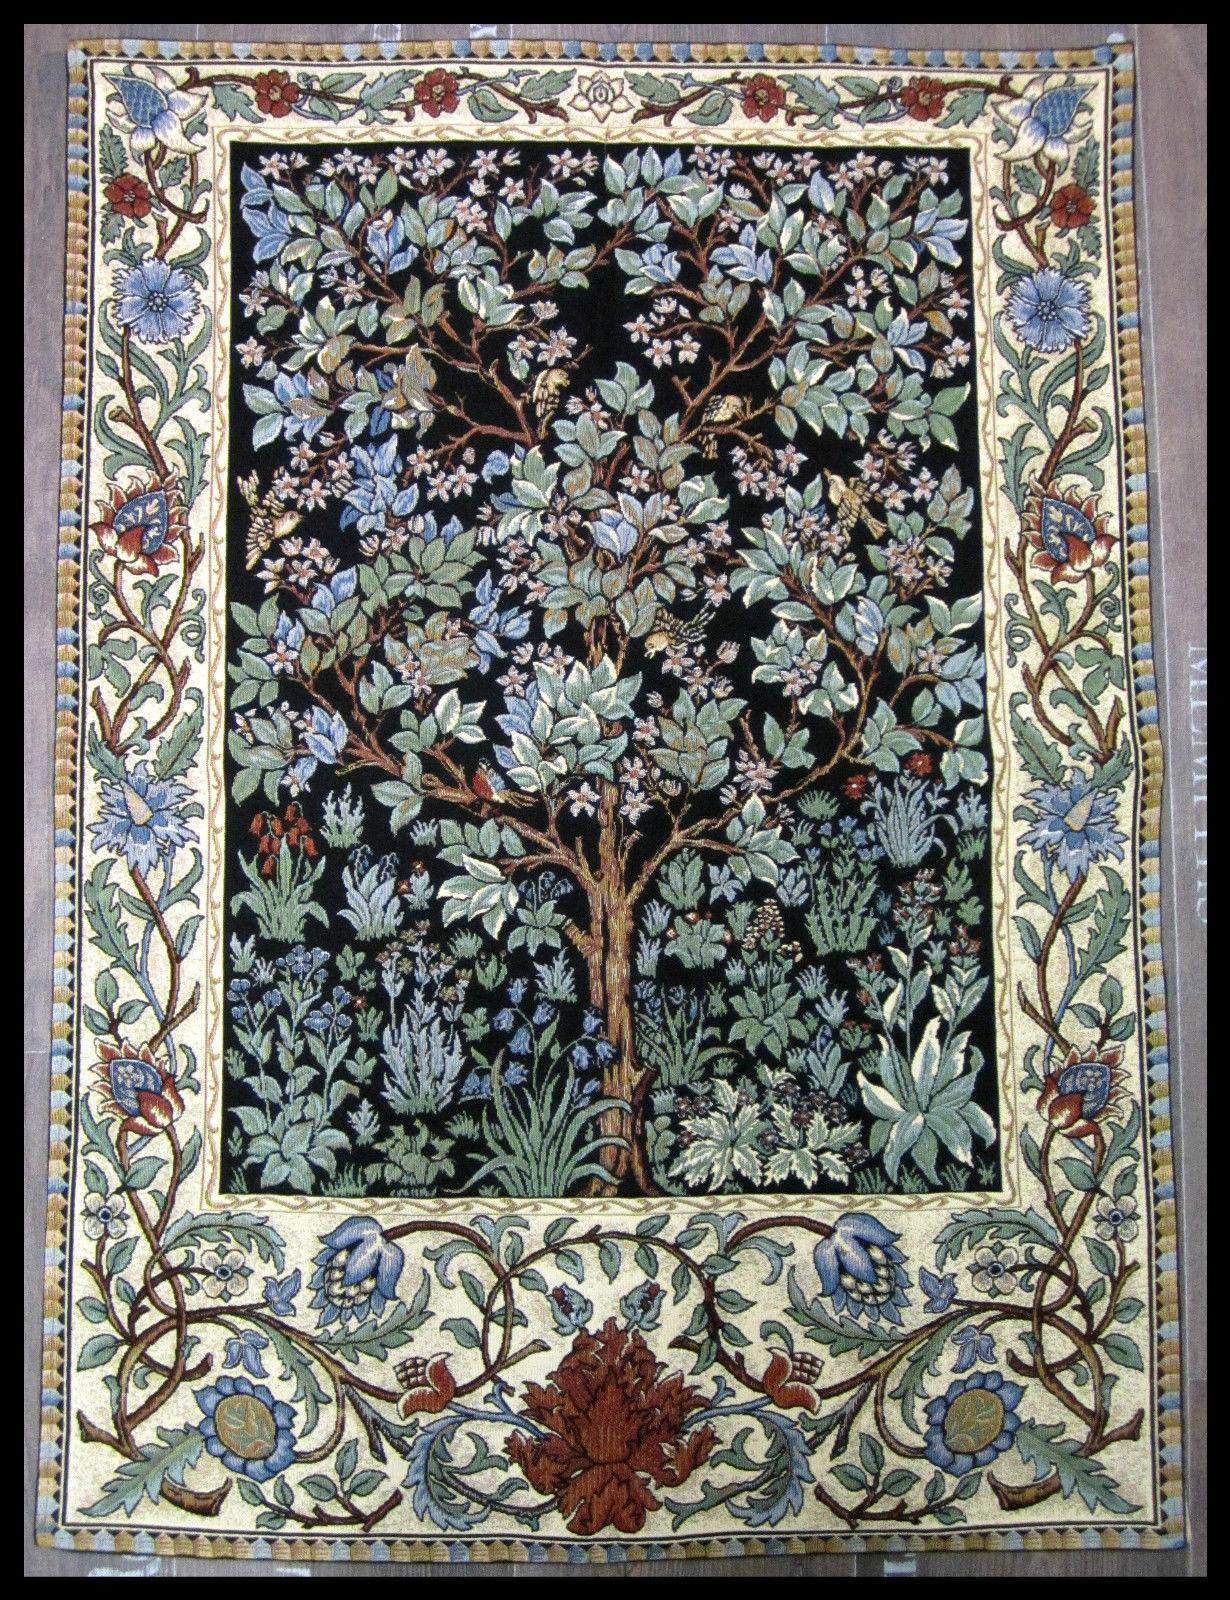 wandteppich gobelin 90cm x 70cm lebensbaum gustav klimt neu the tree of life neu kaufen bei. Black Bedroom Furniture Sets. Home Design Ideas